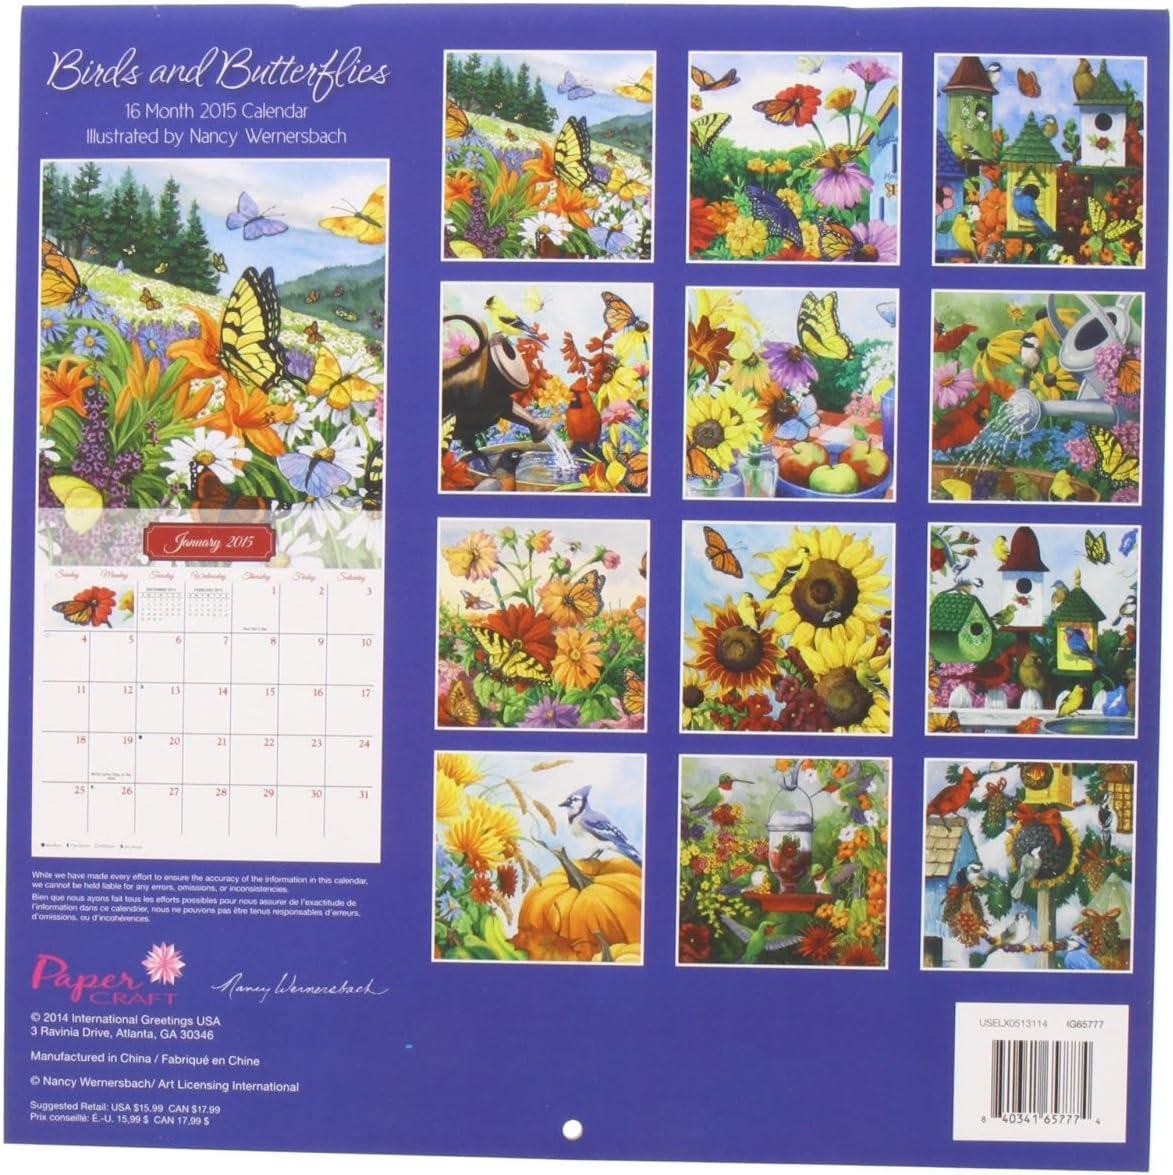 Ravinia 2022 Calendar.Amazon Com 1 X Birds And Butterflies 2015 Calendar By Nancy Wernersbach 16 Month Wall Calendar Office Products